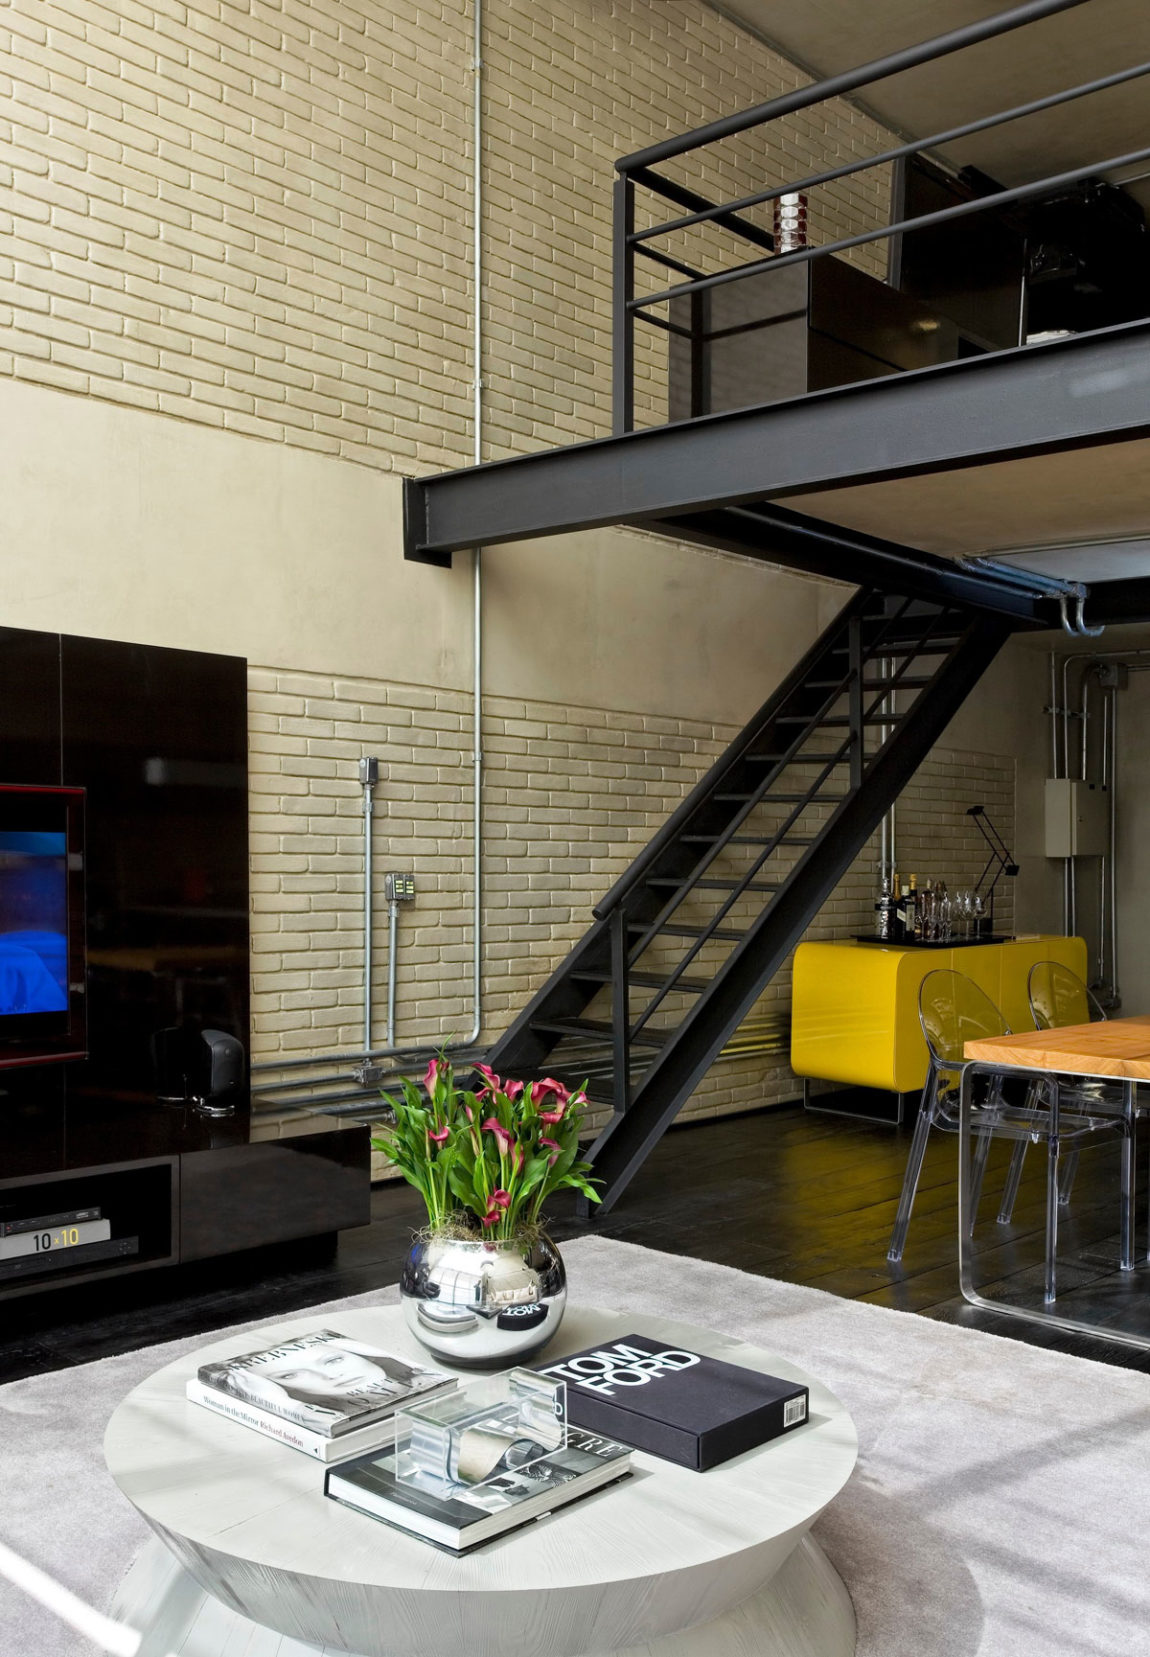 Industrial Loft by Diego Revollo Arquitetura (8)